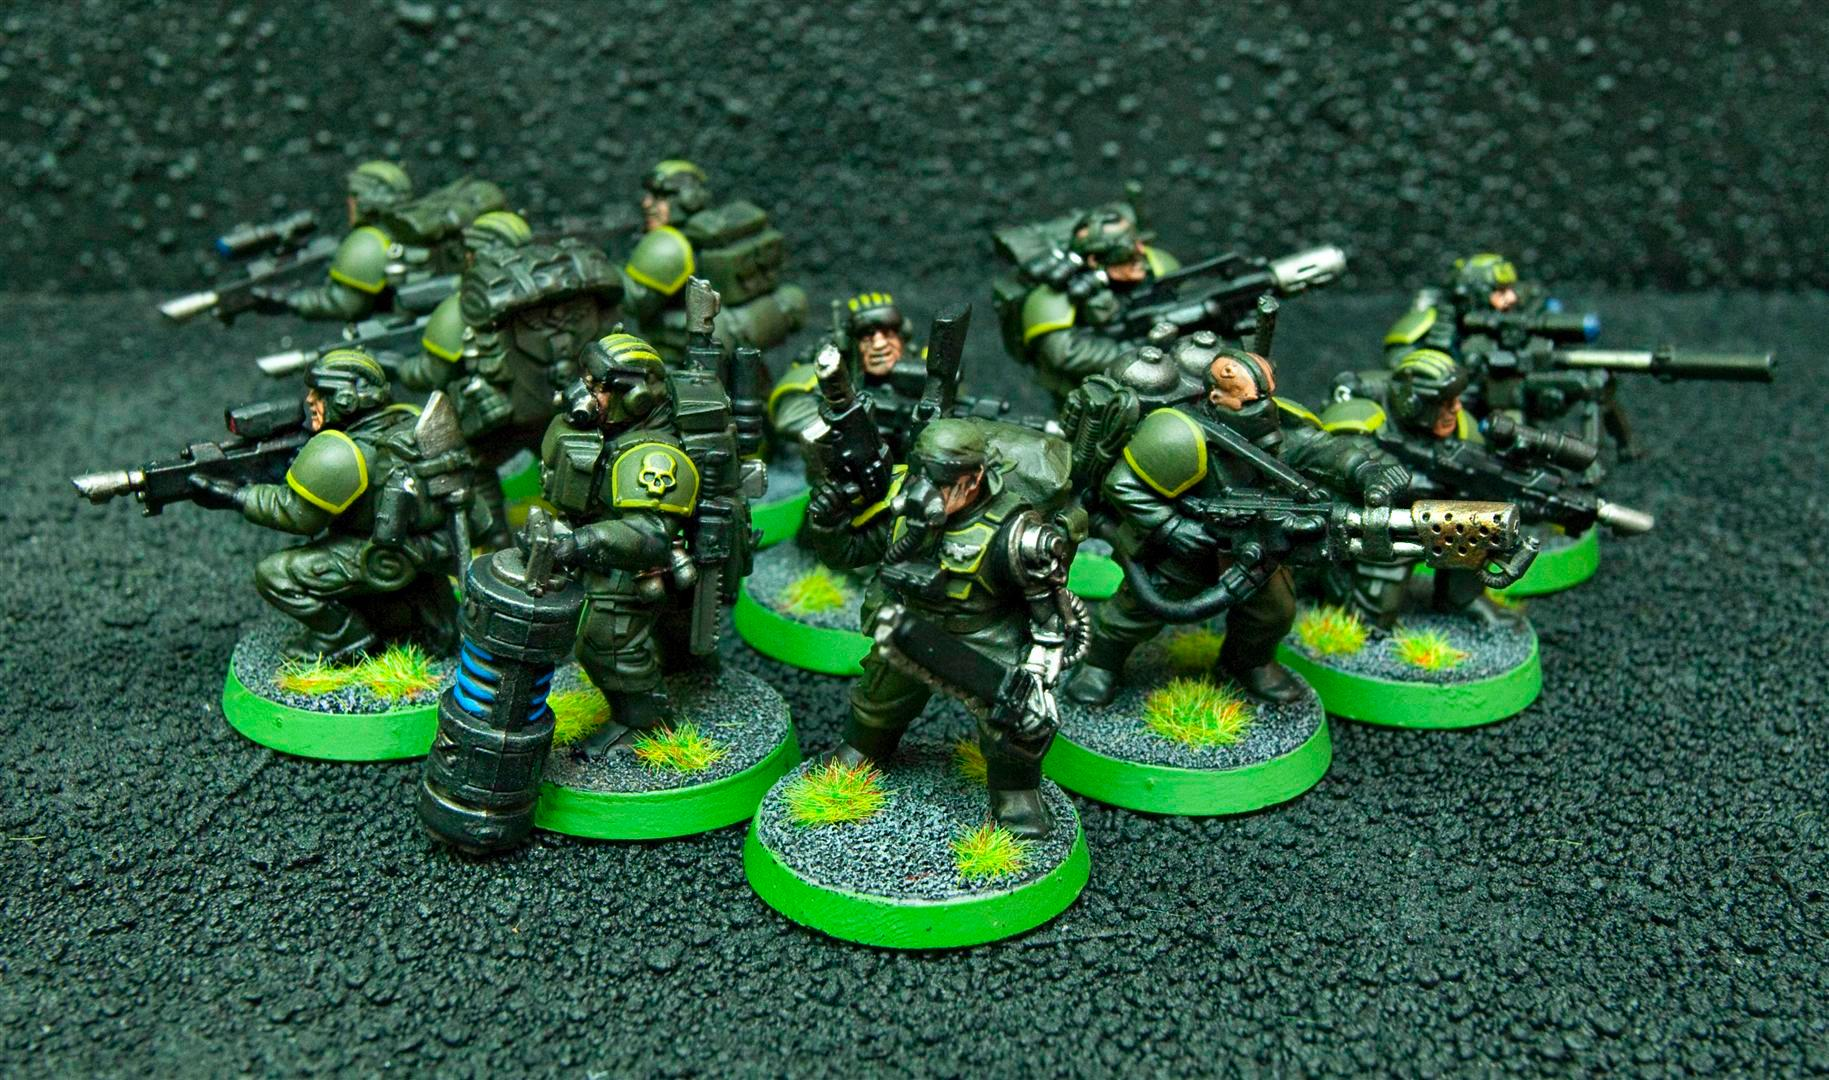 Astra Militarum, Bionics, Demolition Charge, Demolitions, Flamer, Guard, Guardsmen, Imperial Guard, Imperial Guard Veteran Squad, Meltagun, Sgt, Sniper Rifle, Targeter, Veteran